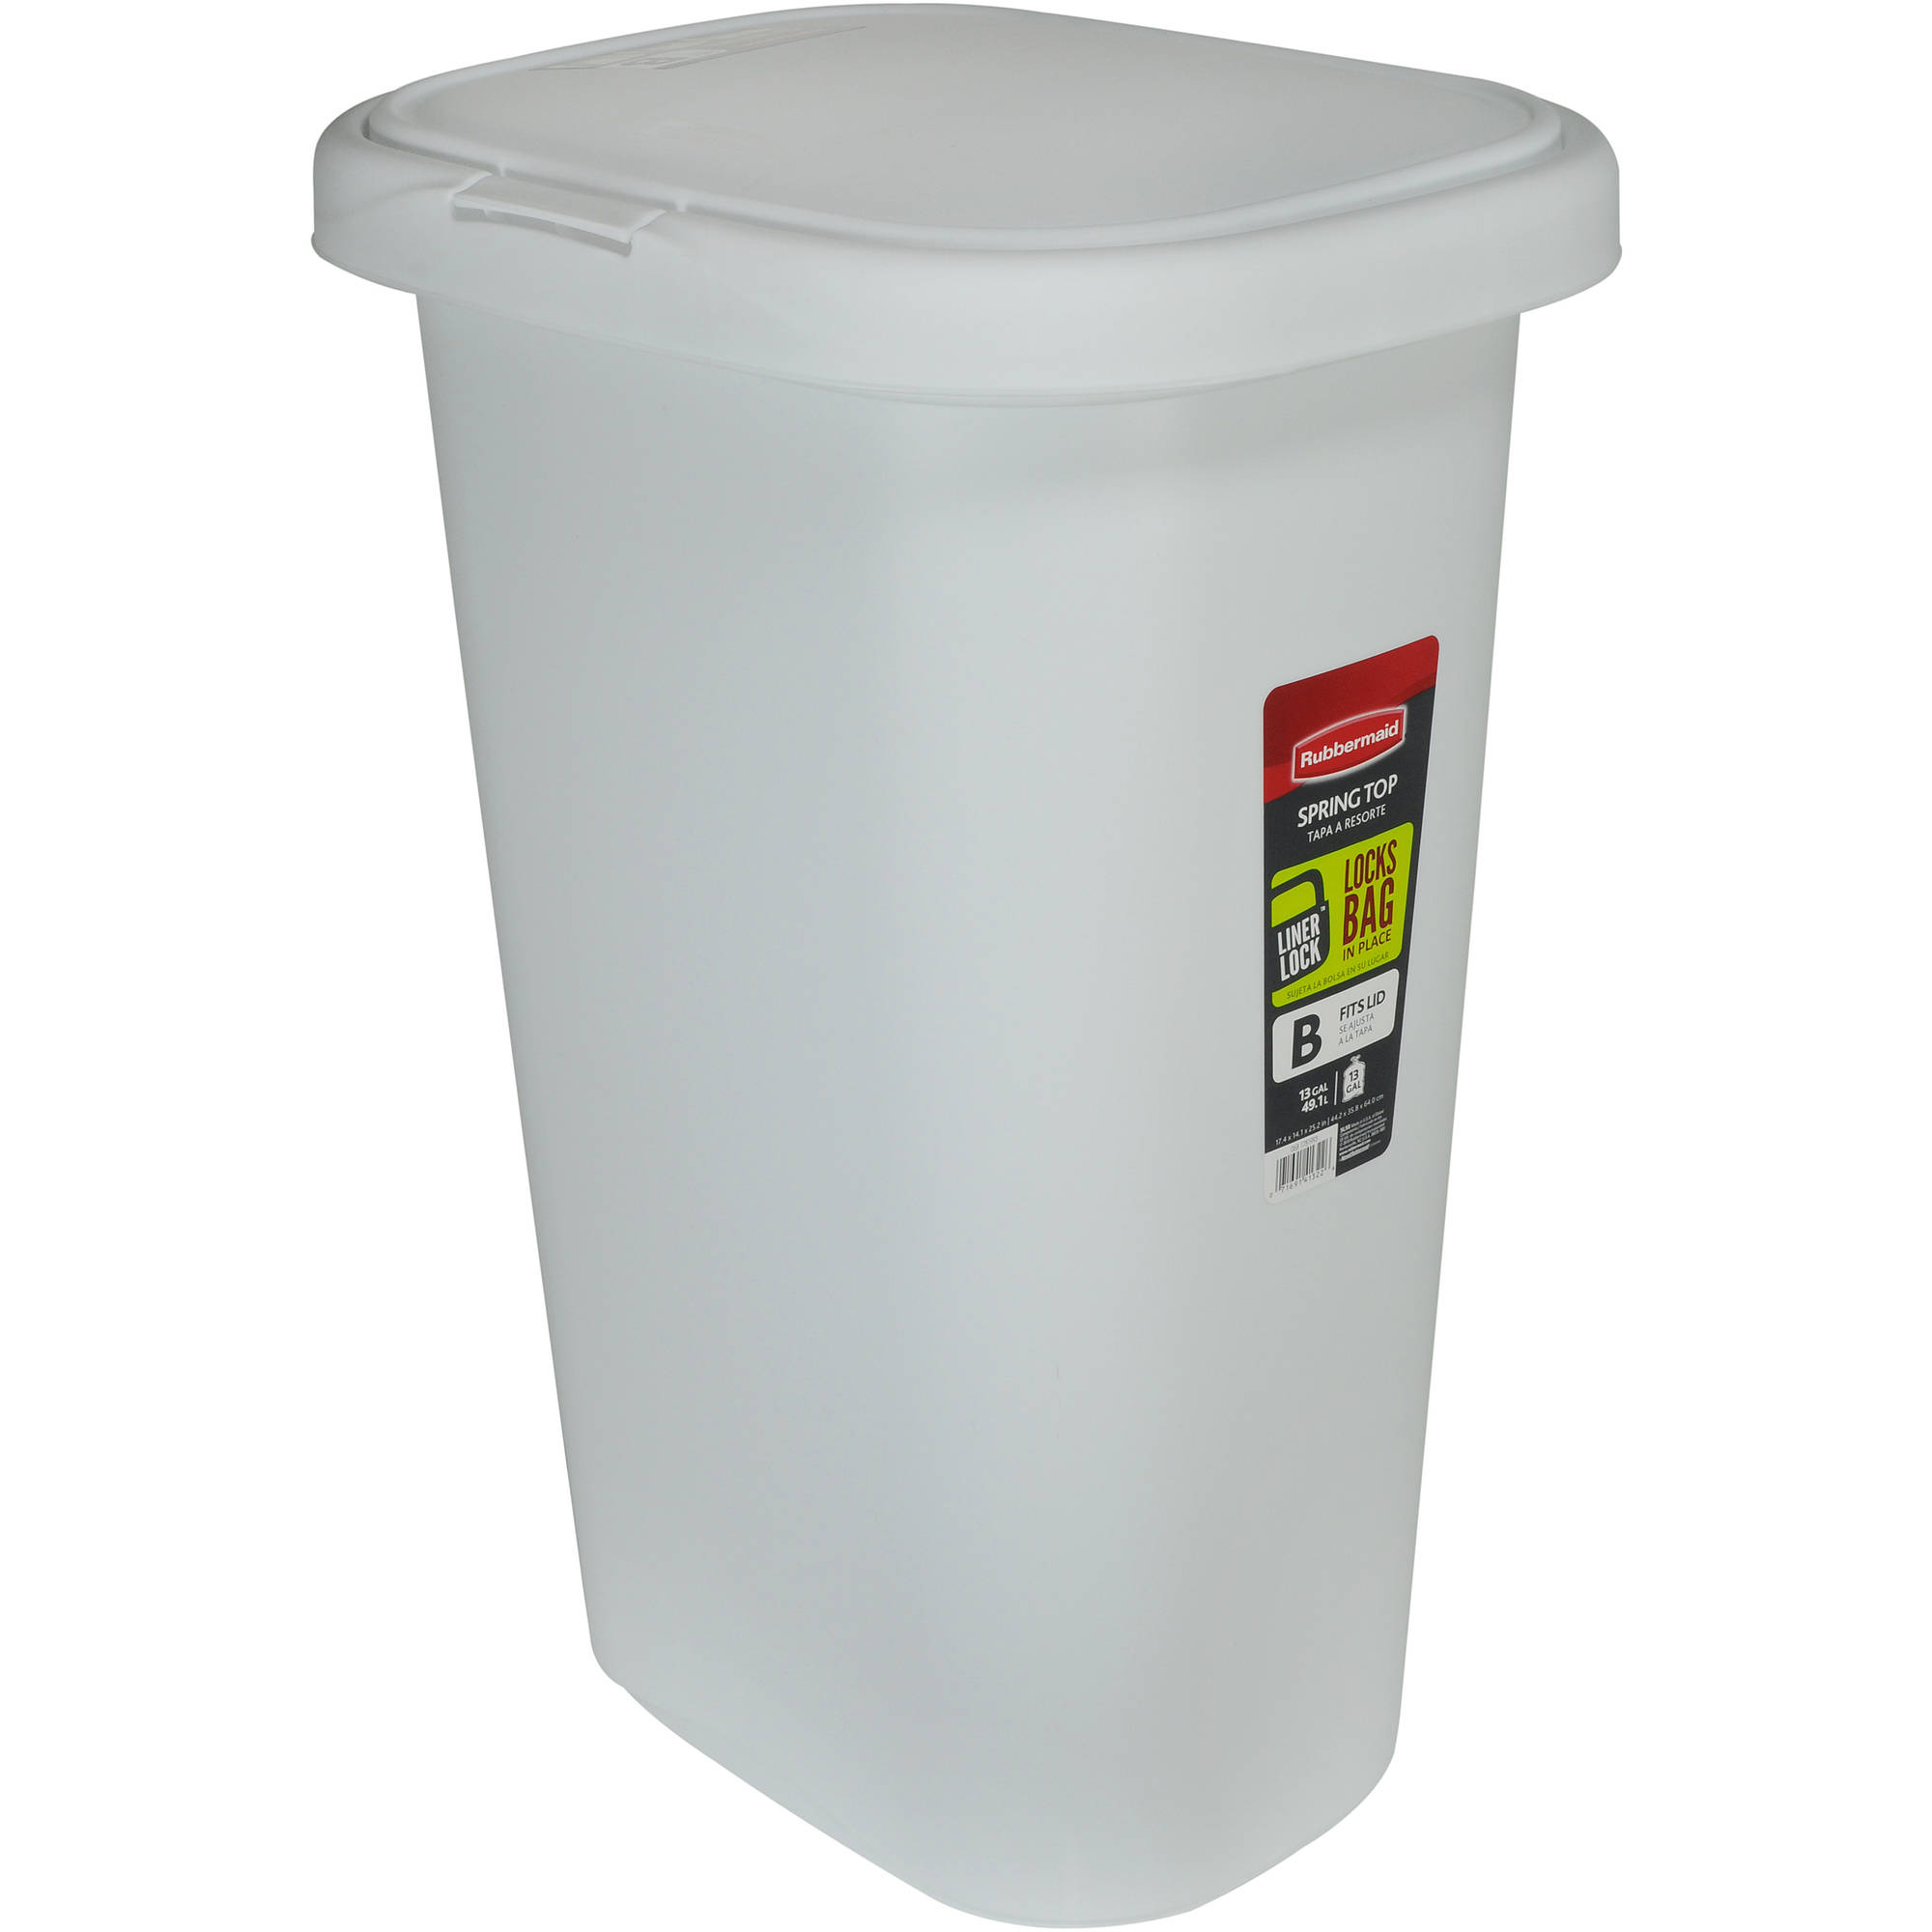 Rubbermaid Spring Top Wastebasket With Liner Lock Plastic 13 Gal White Walmart Com Walmart Com